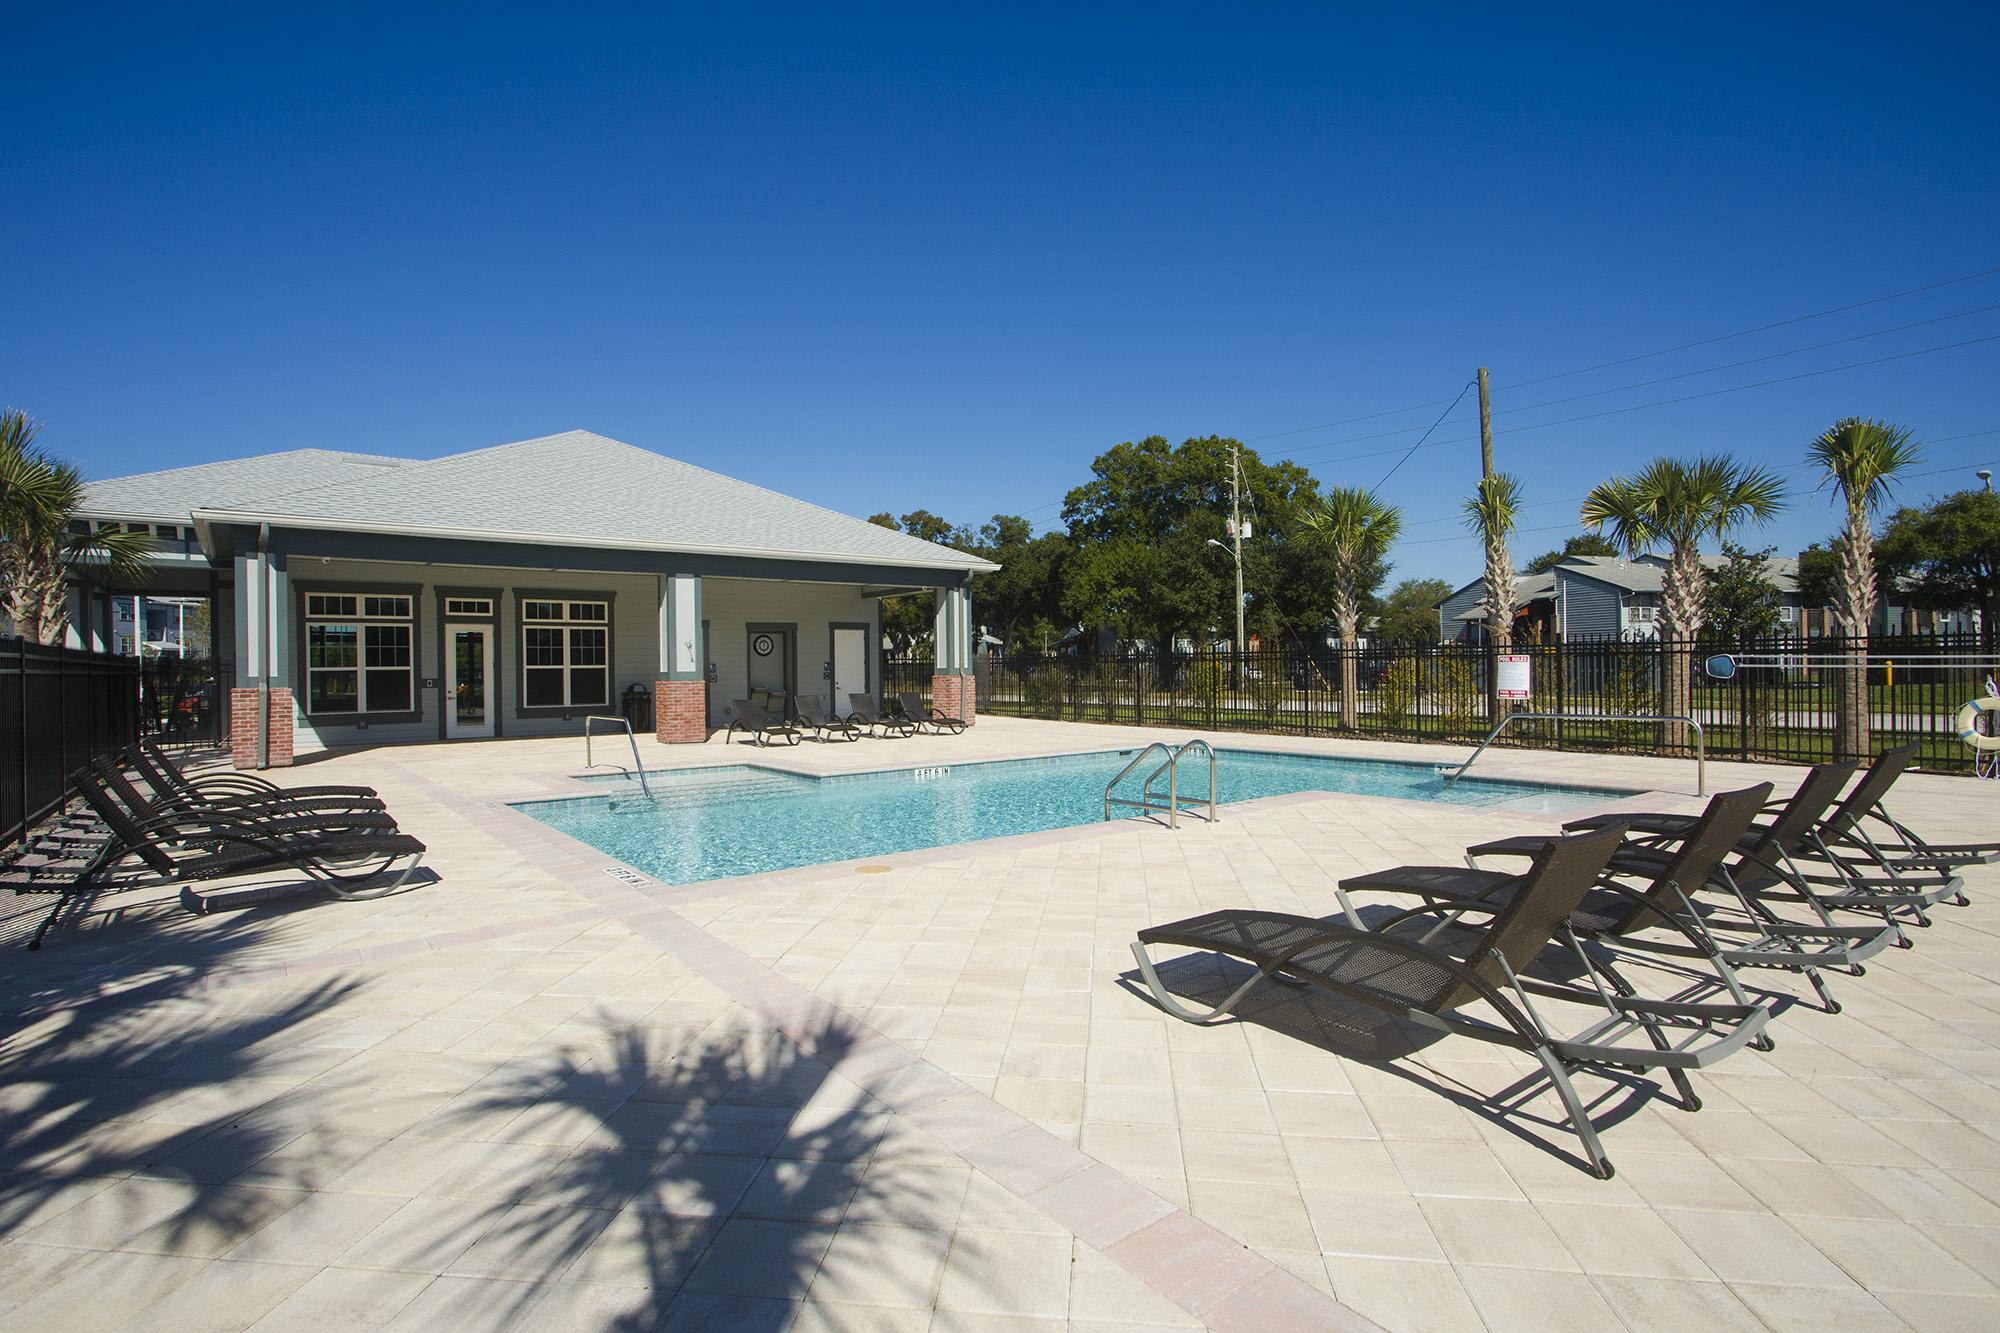 CharlestonEdge-Rental-Apartment-Brandon-Tampa-Florida-Pool-Bedrooms-Pool-2.jpg